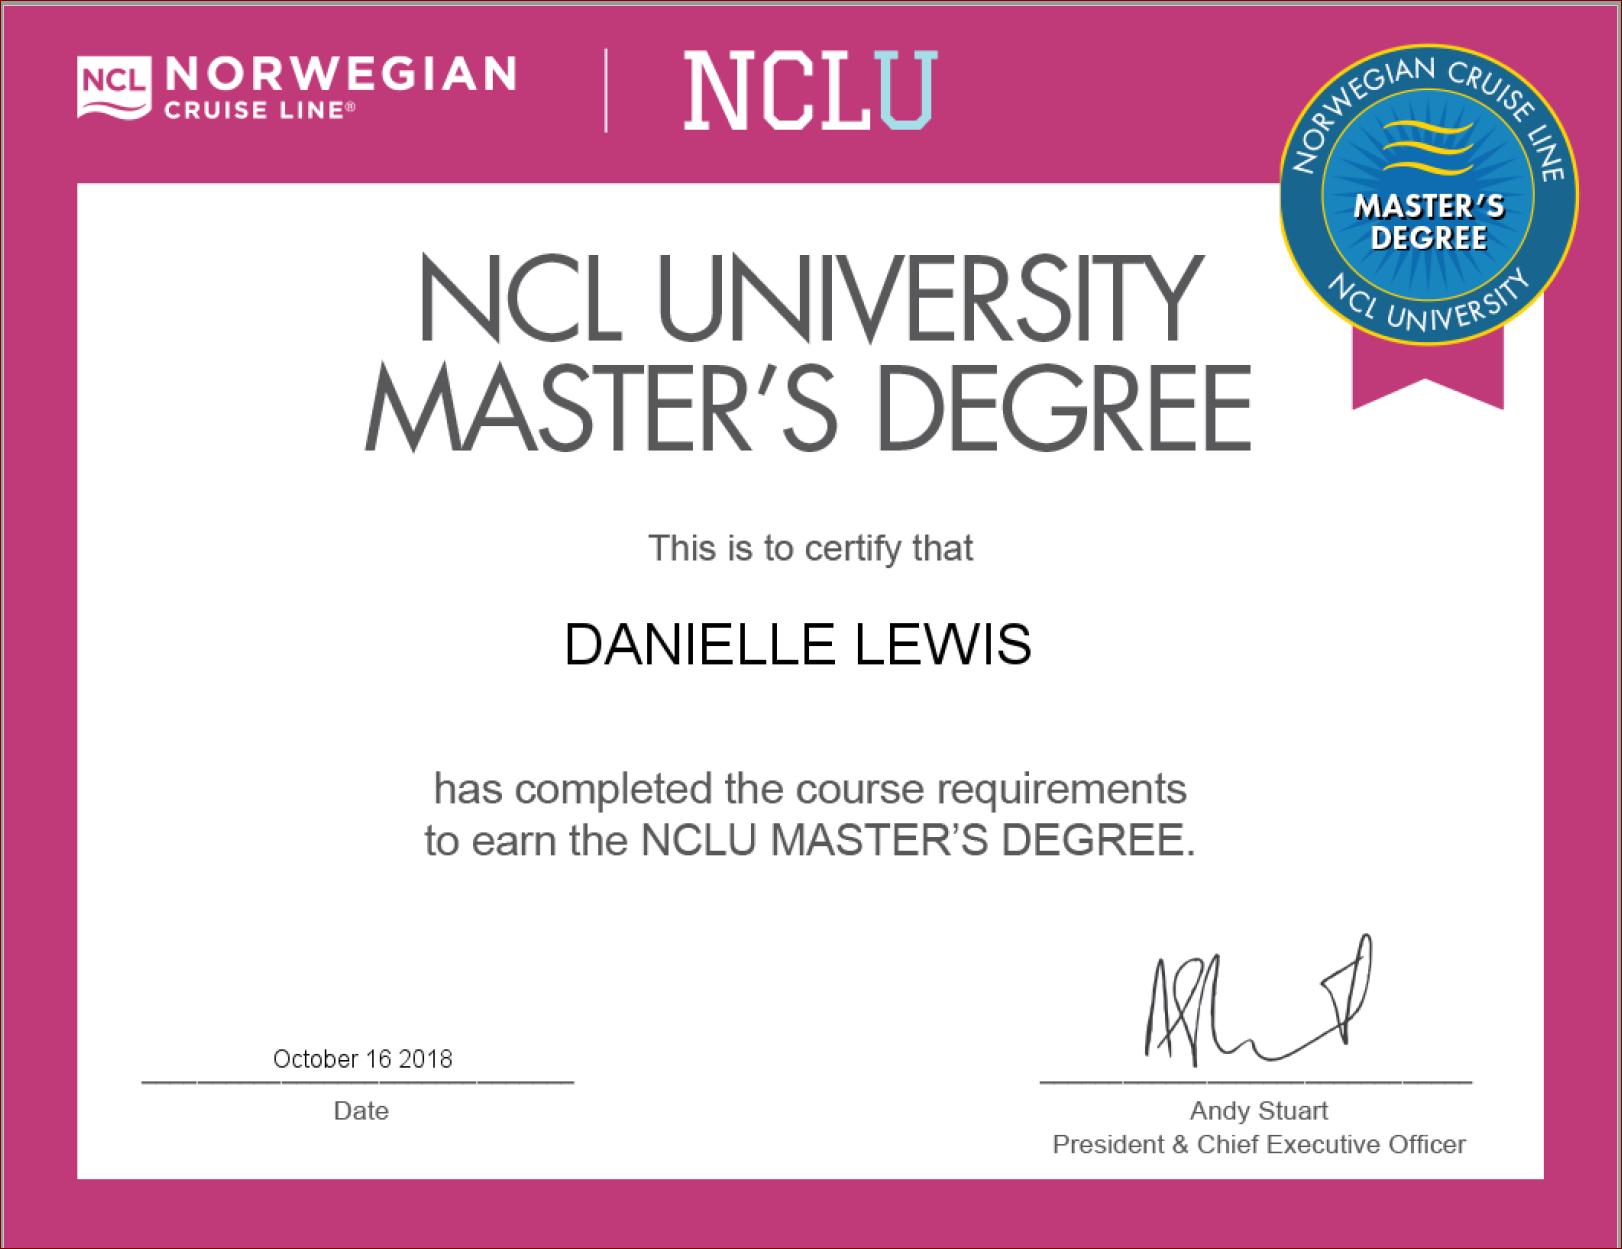 SelfishMe Travel - Norwegian Cruise Line University Master's Degree